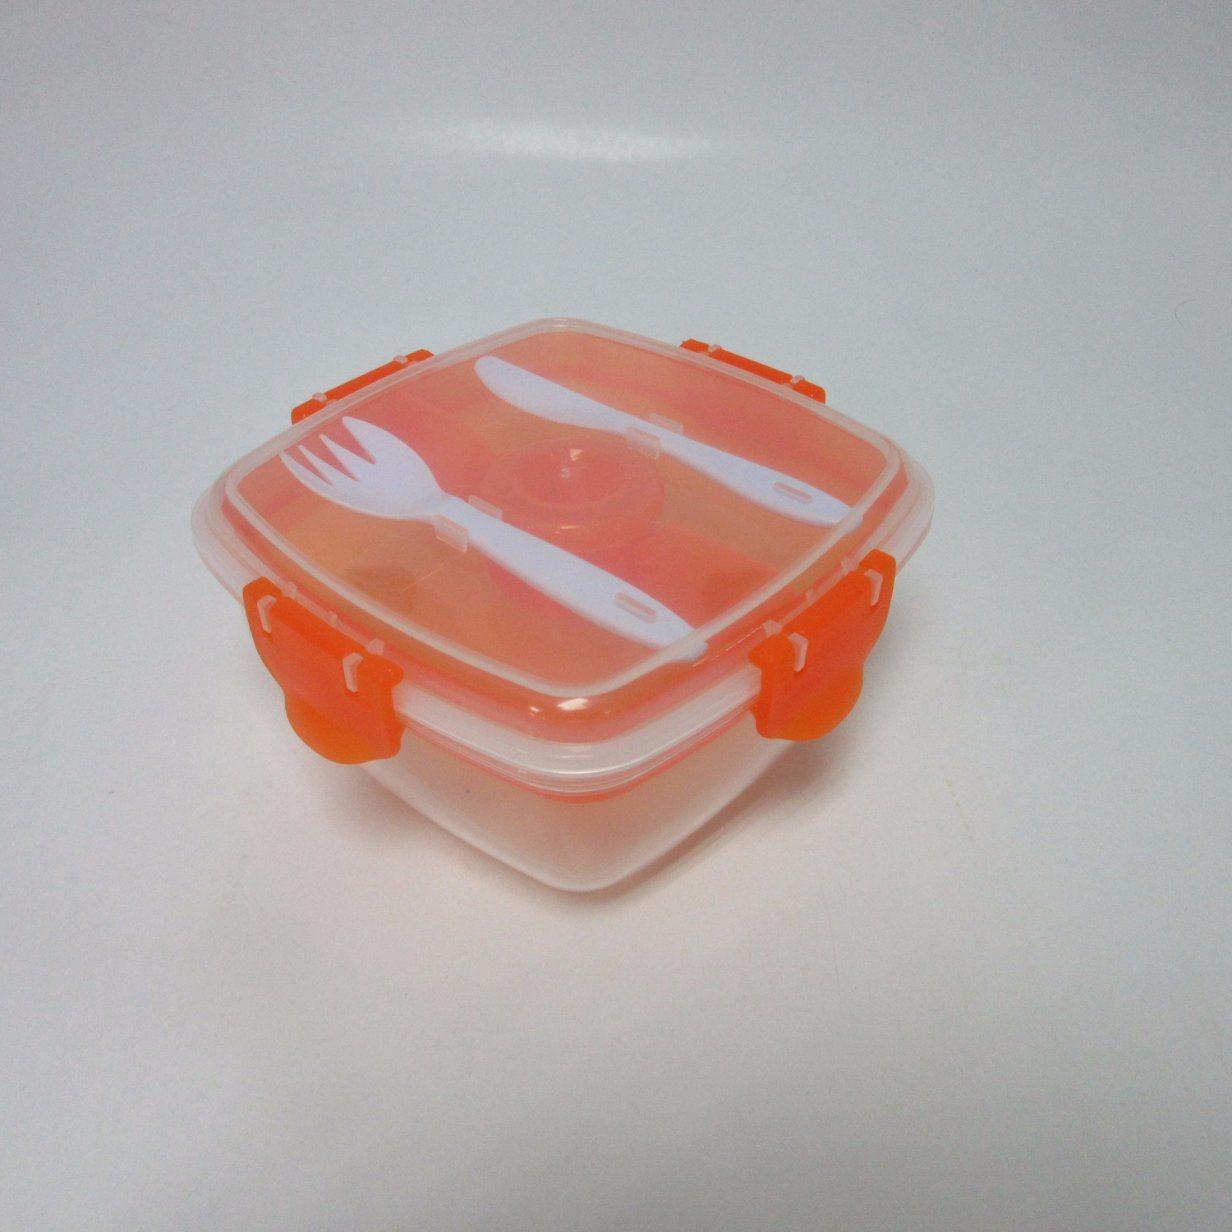 30 Oz Cold & Fresh Longer Square Lunch Box